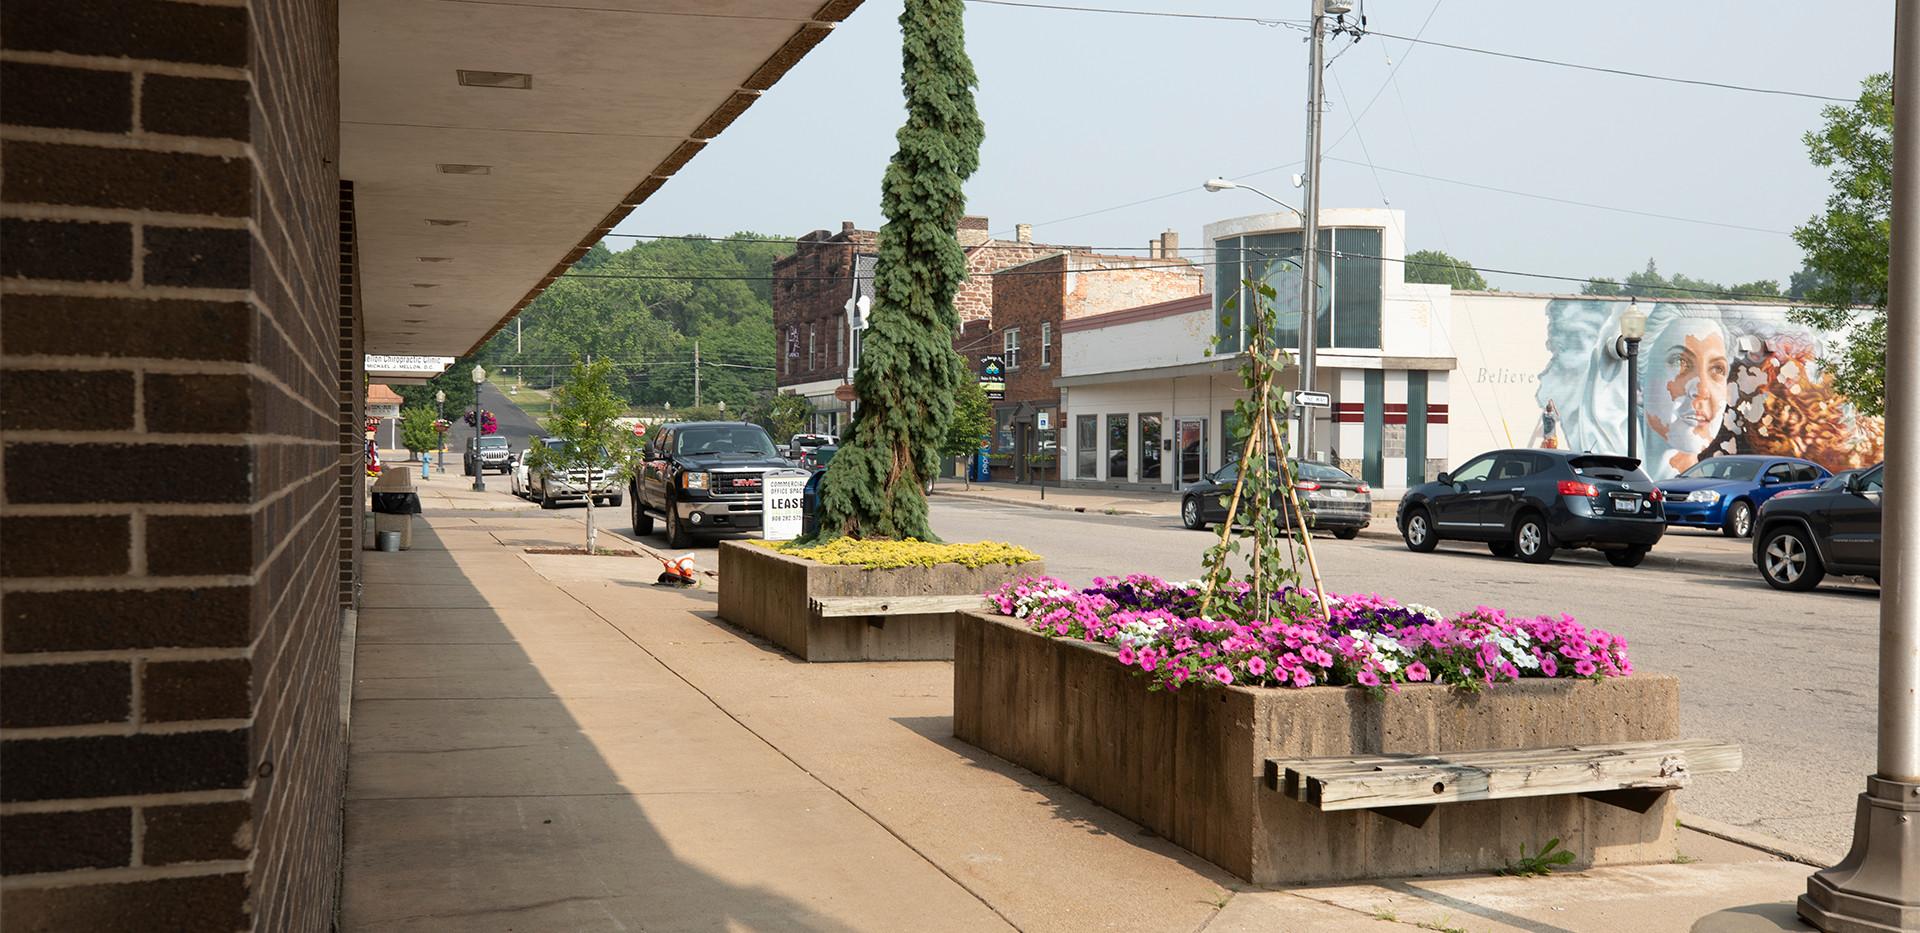 Franklin-Square-Exterior-Sidewalk.jpg